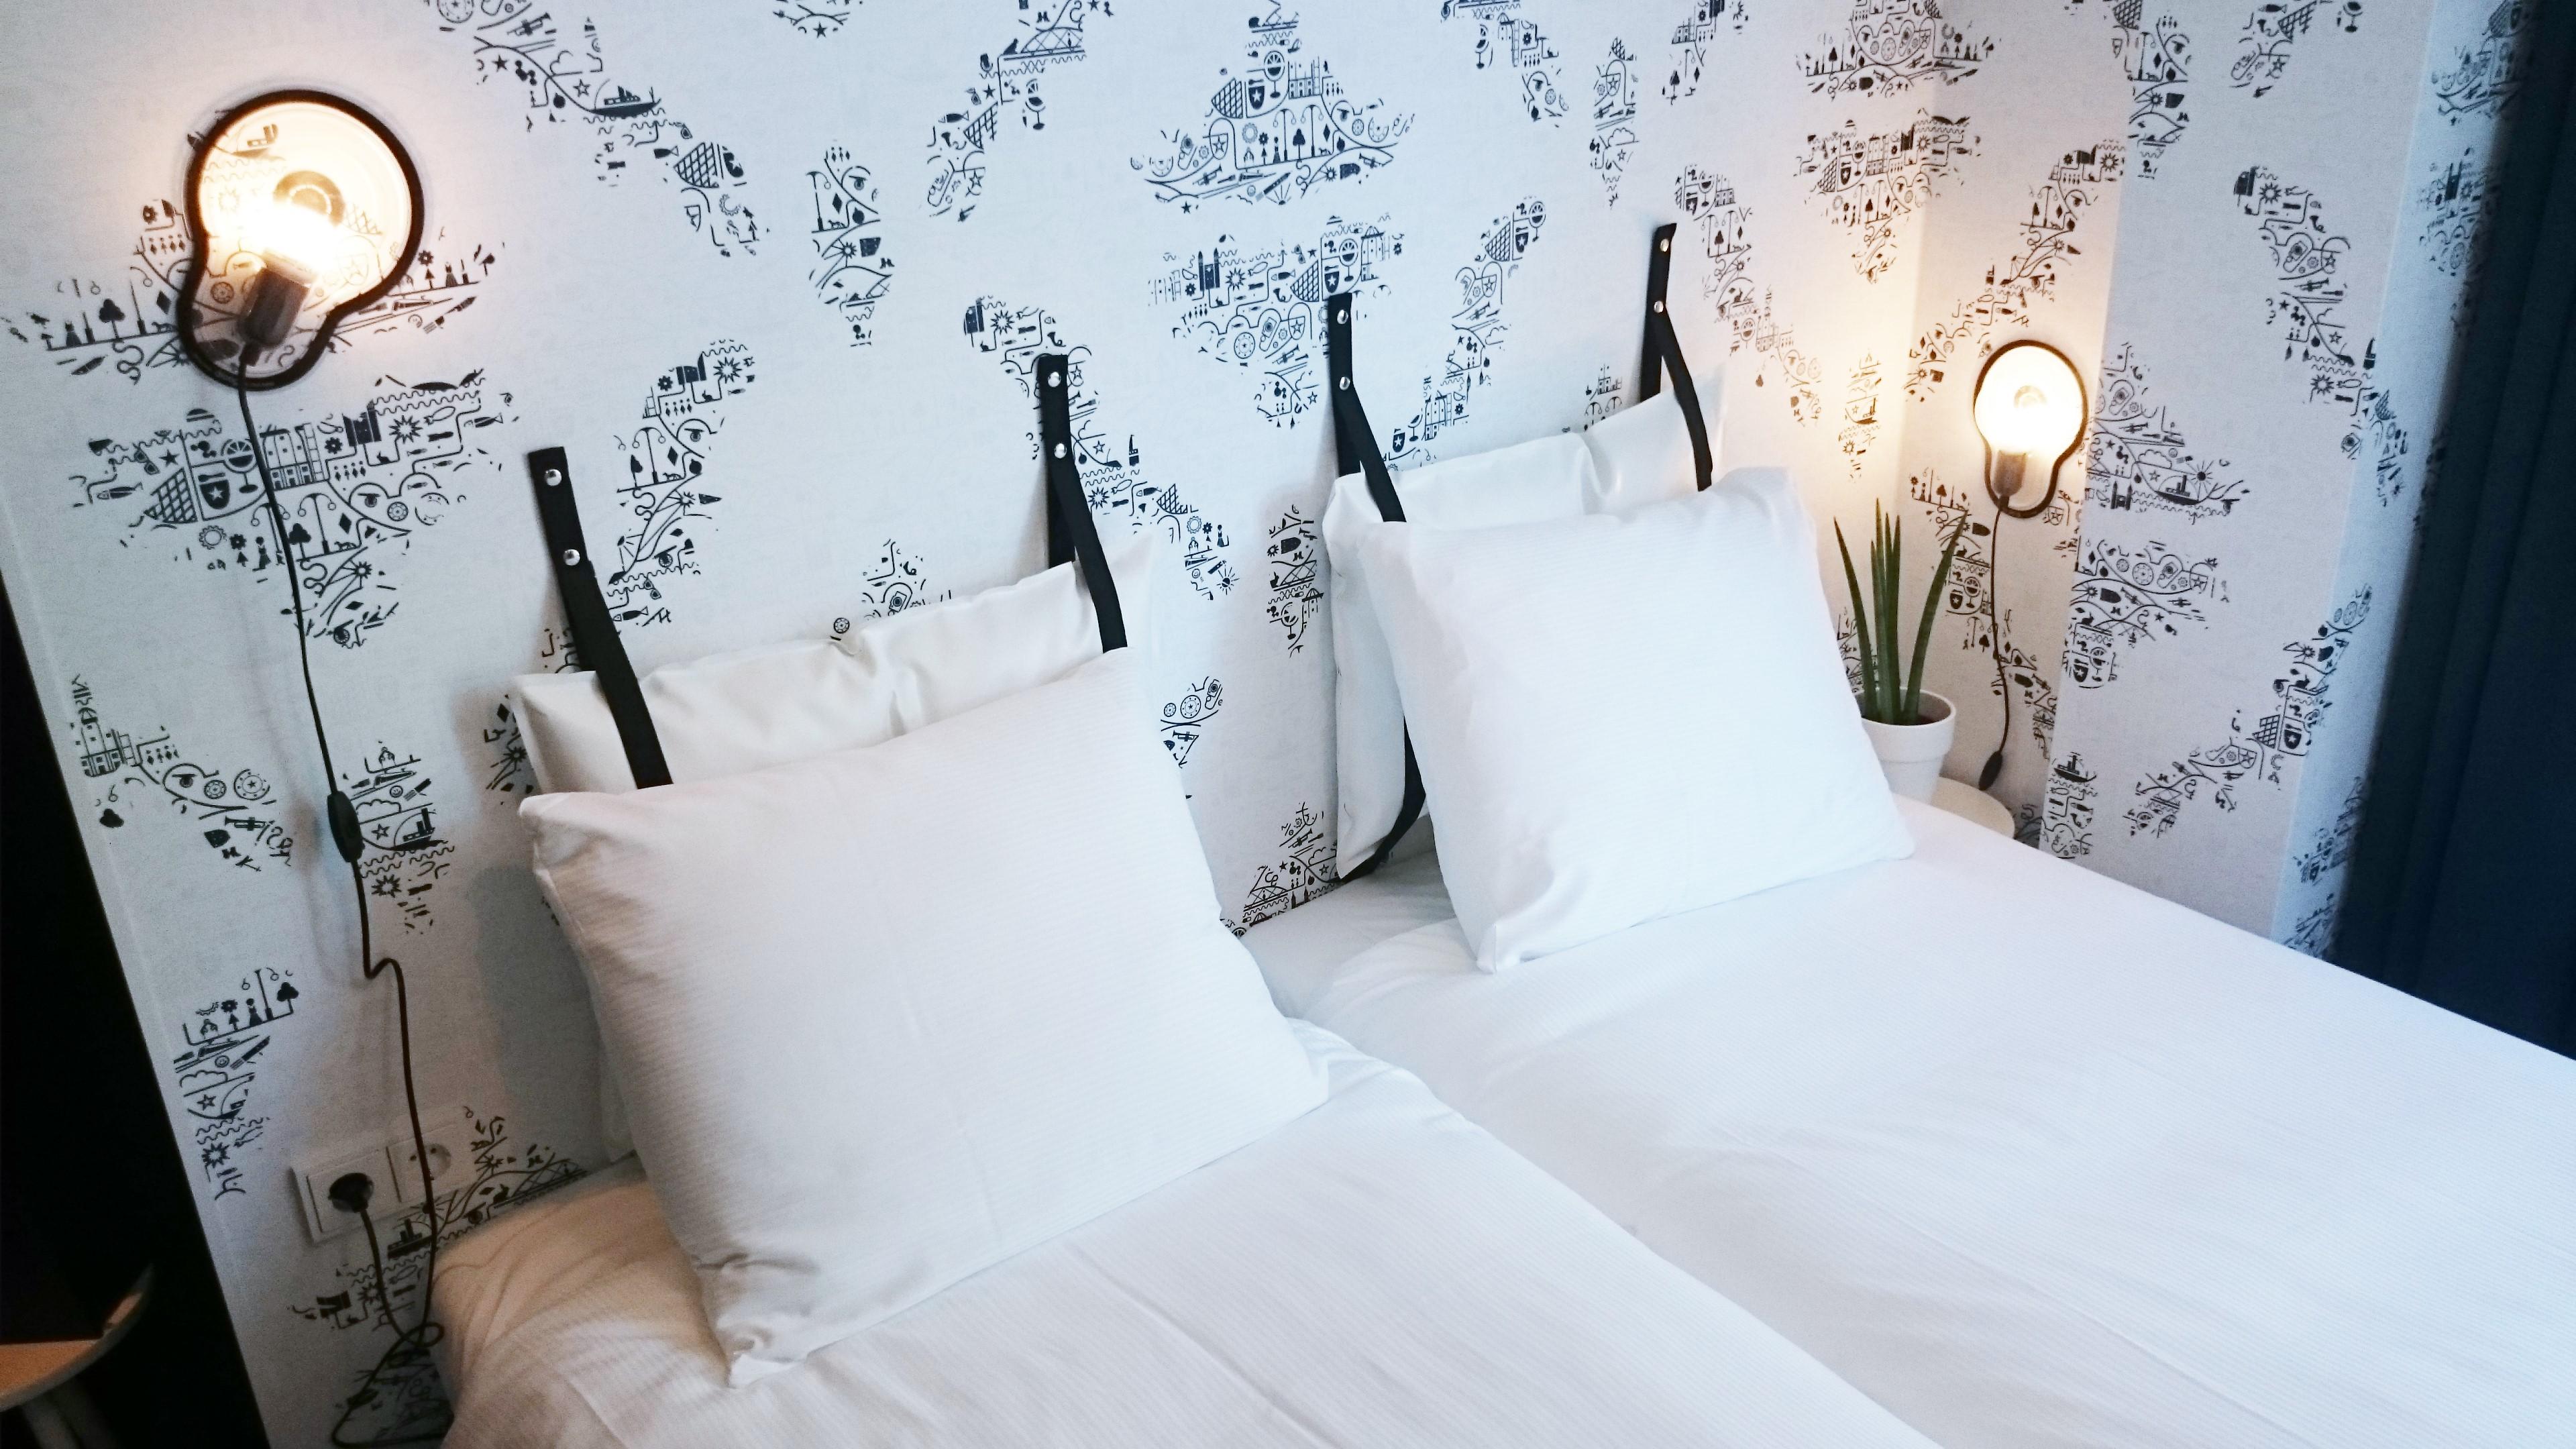 Kaboom Hotel Maatsricht - Daily Cappuccino - Lifestyle Blog